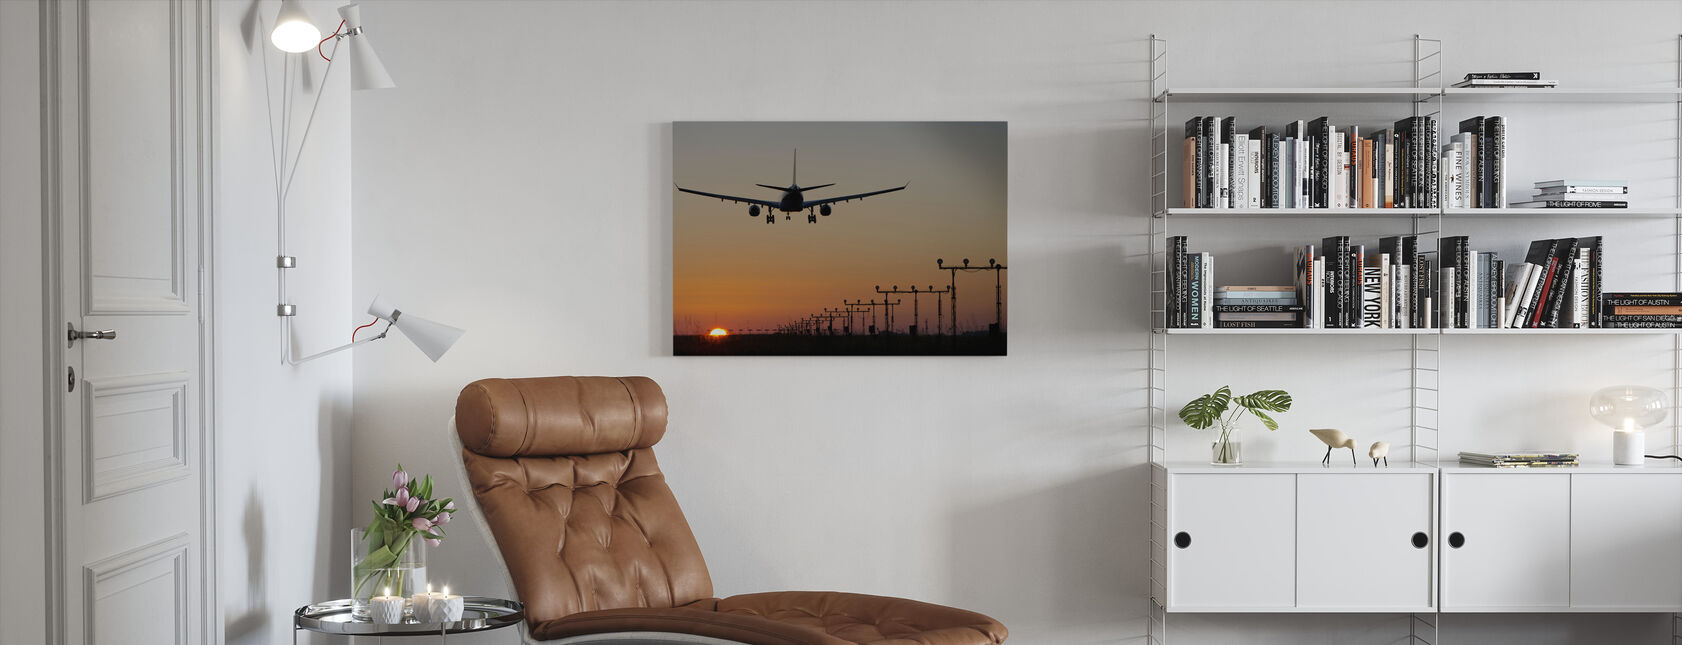 Solnedgang Landing - Lerretsbilde - Stue